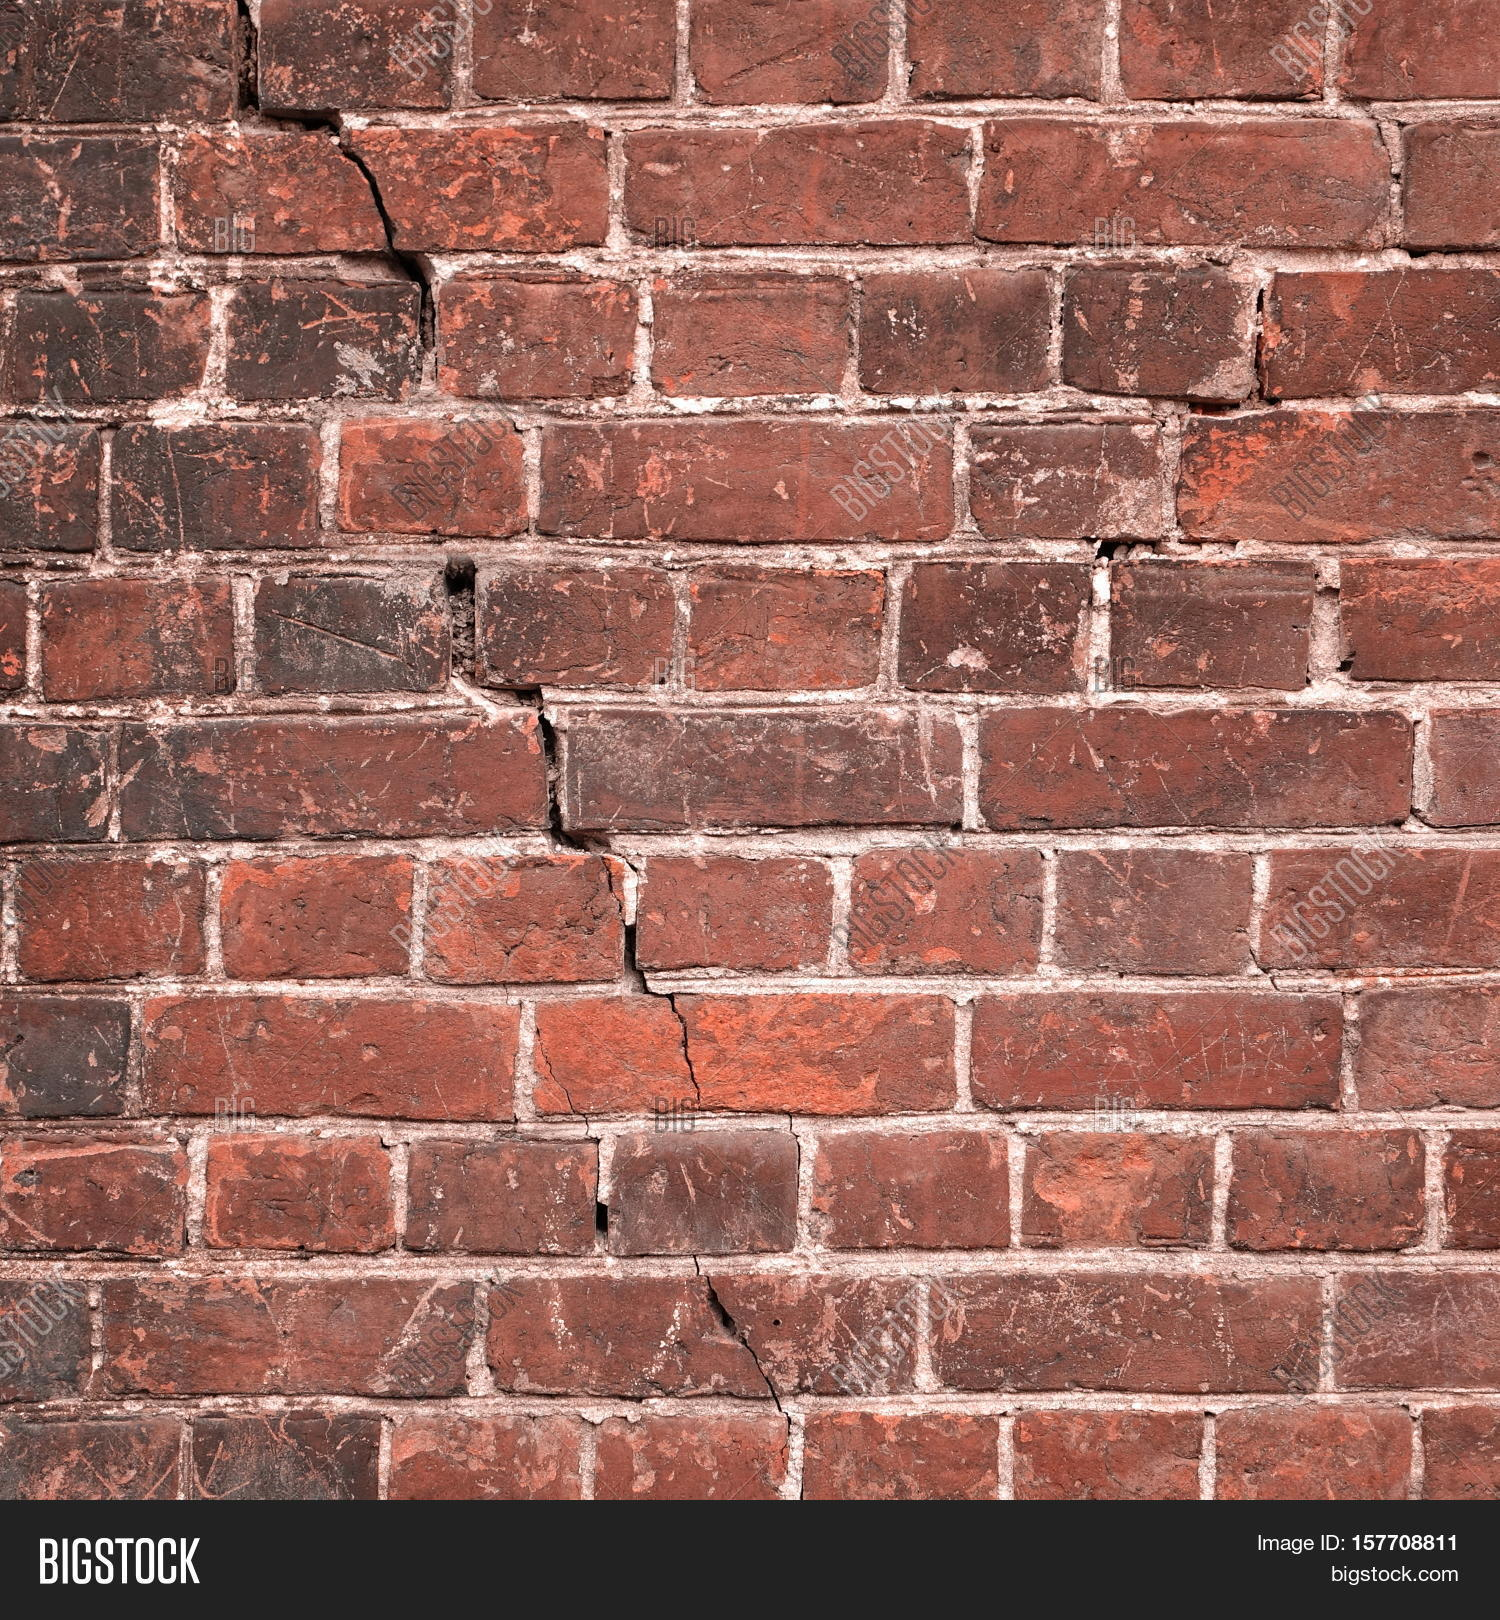 Brick wall - a good element of the interior